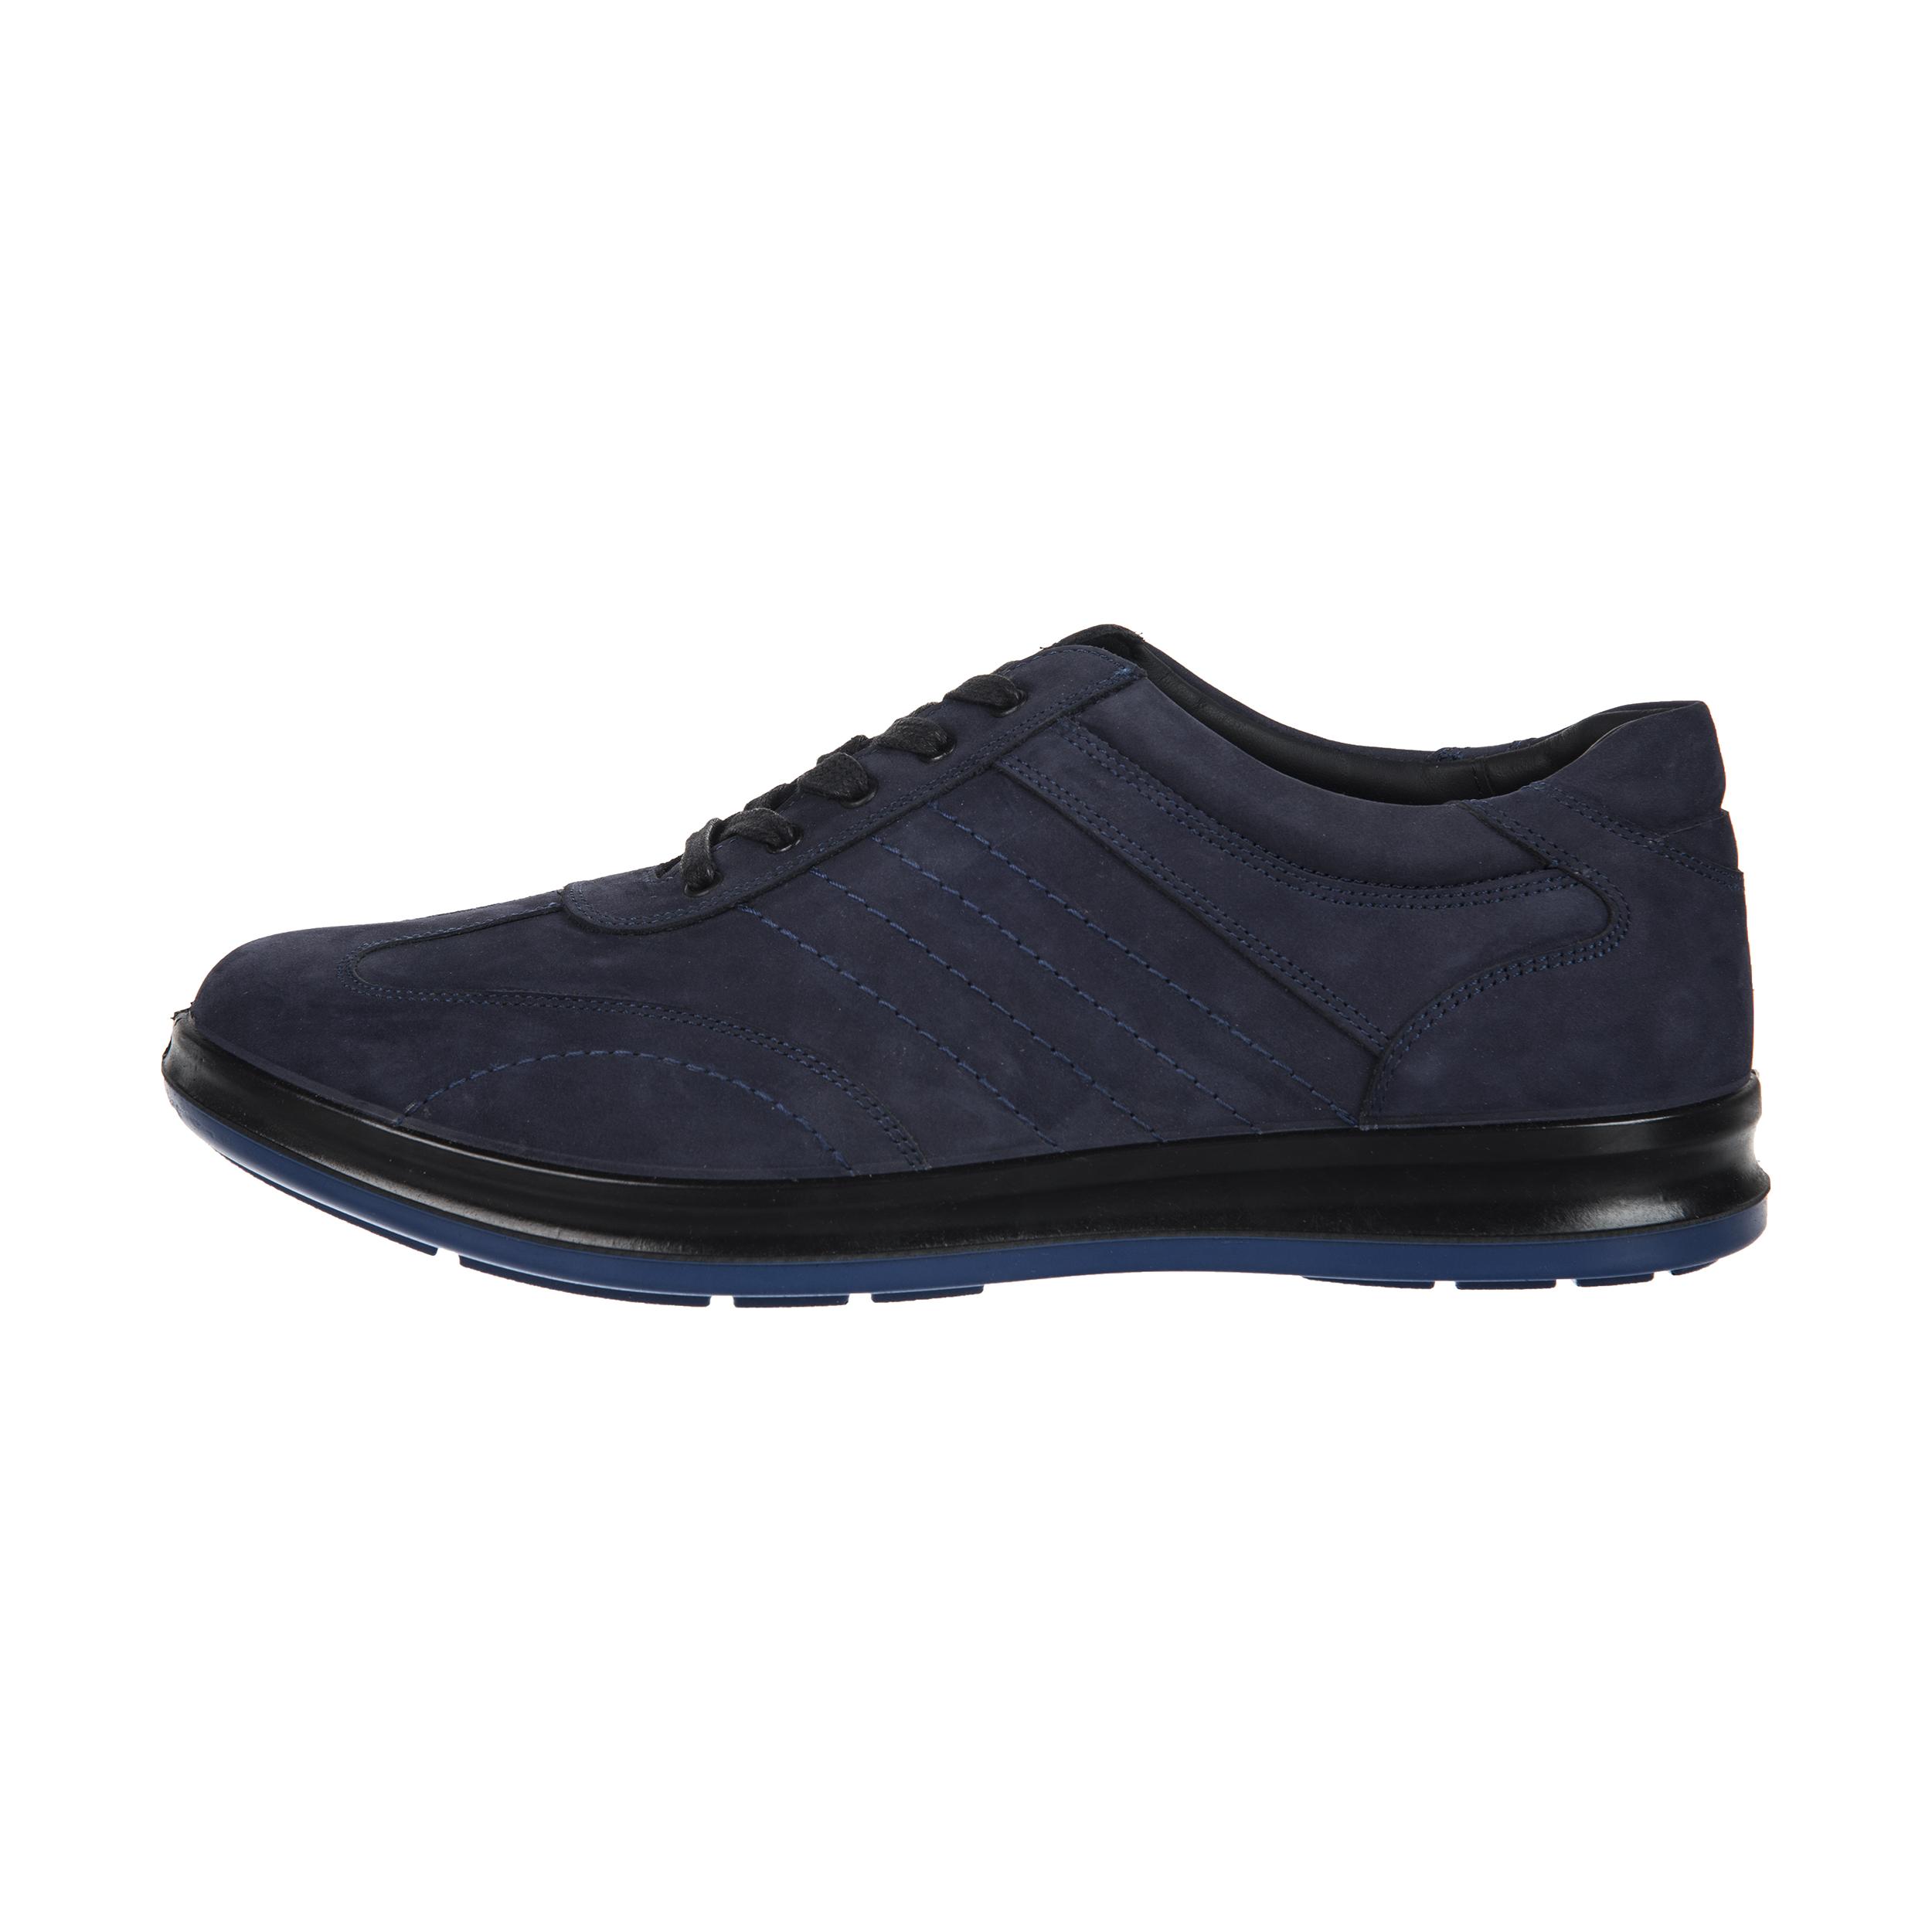 کفش مردانه دنیلی مدل 113070312472